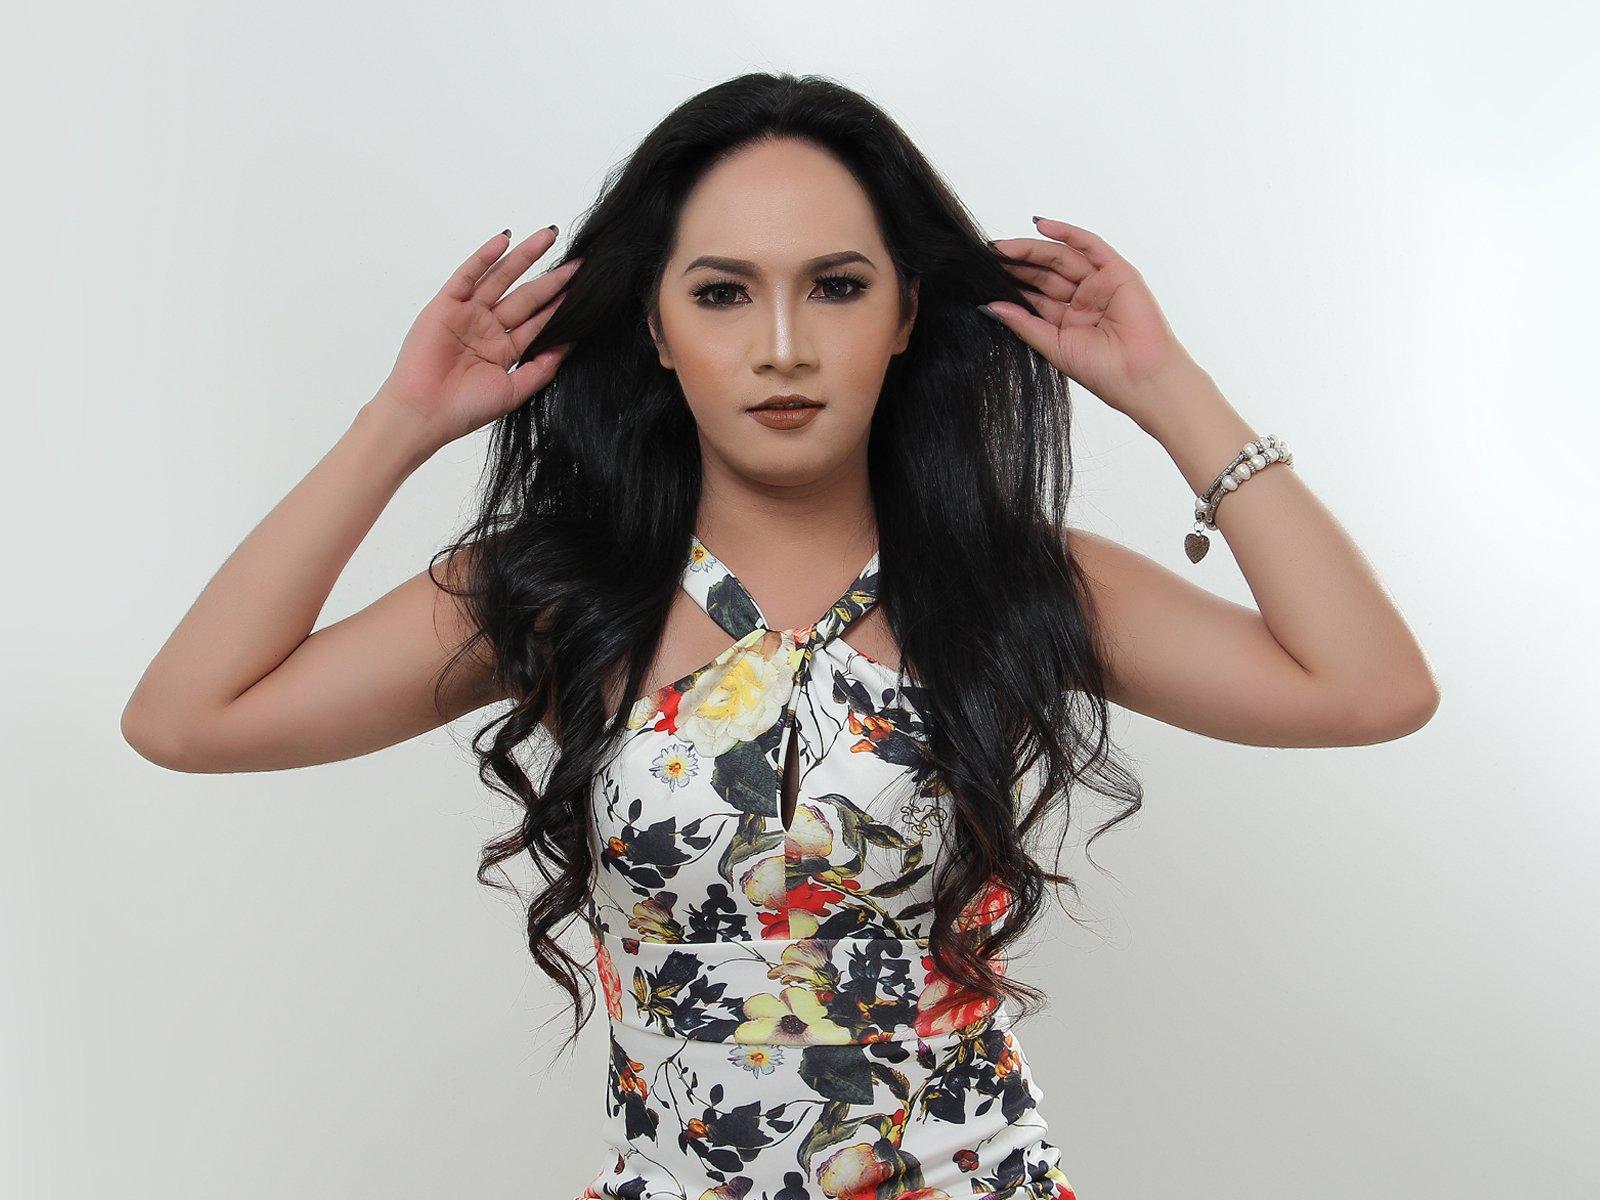 Yourrrangel Ladyboy, Filipino Transsexual escort in Makati